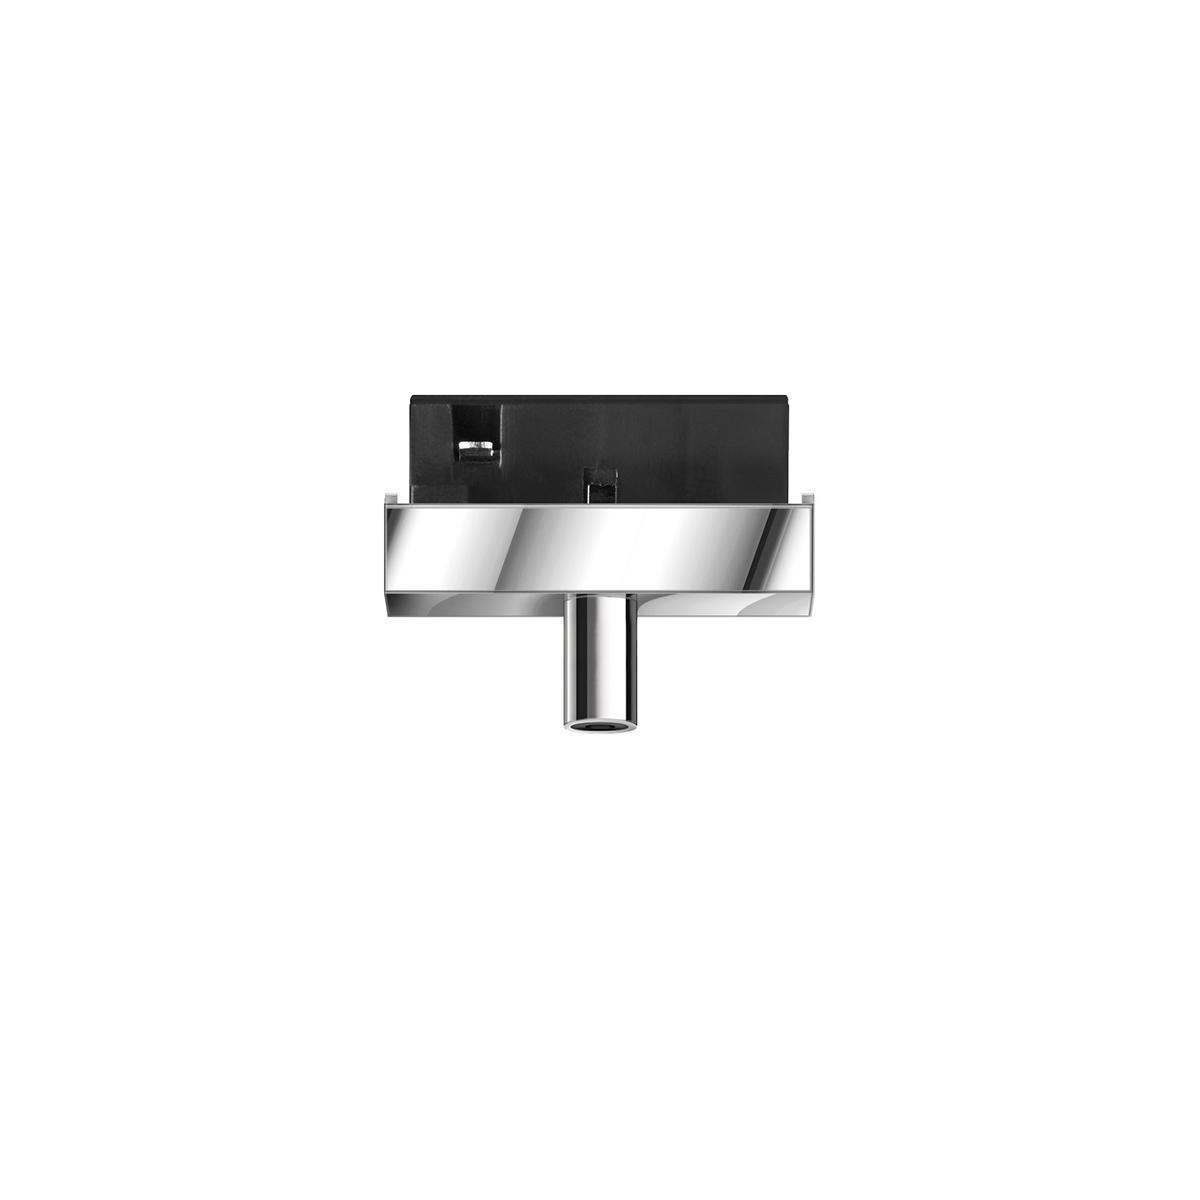 Bruck Duolare Leuchten Adapter 860158ch